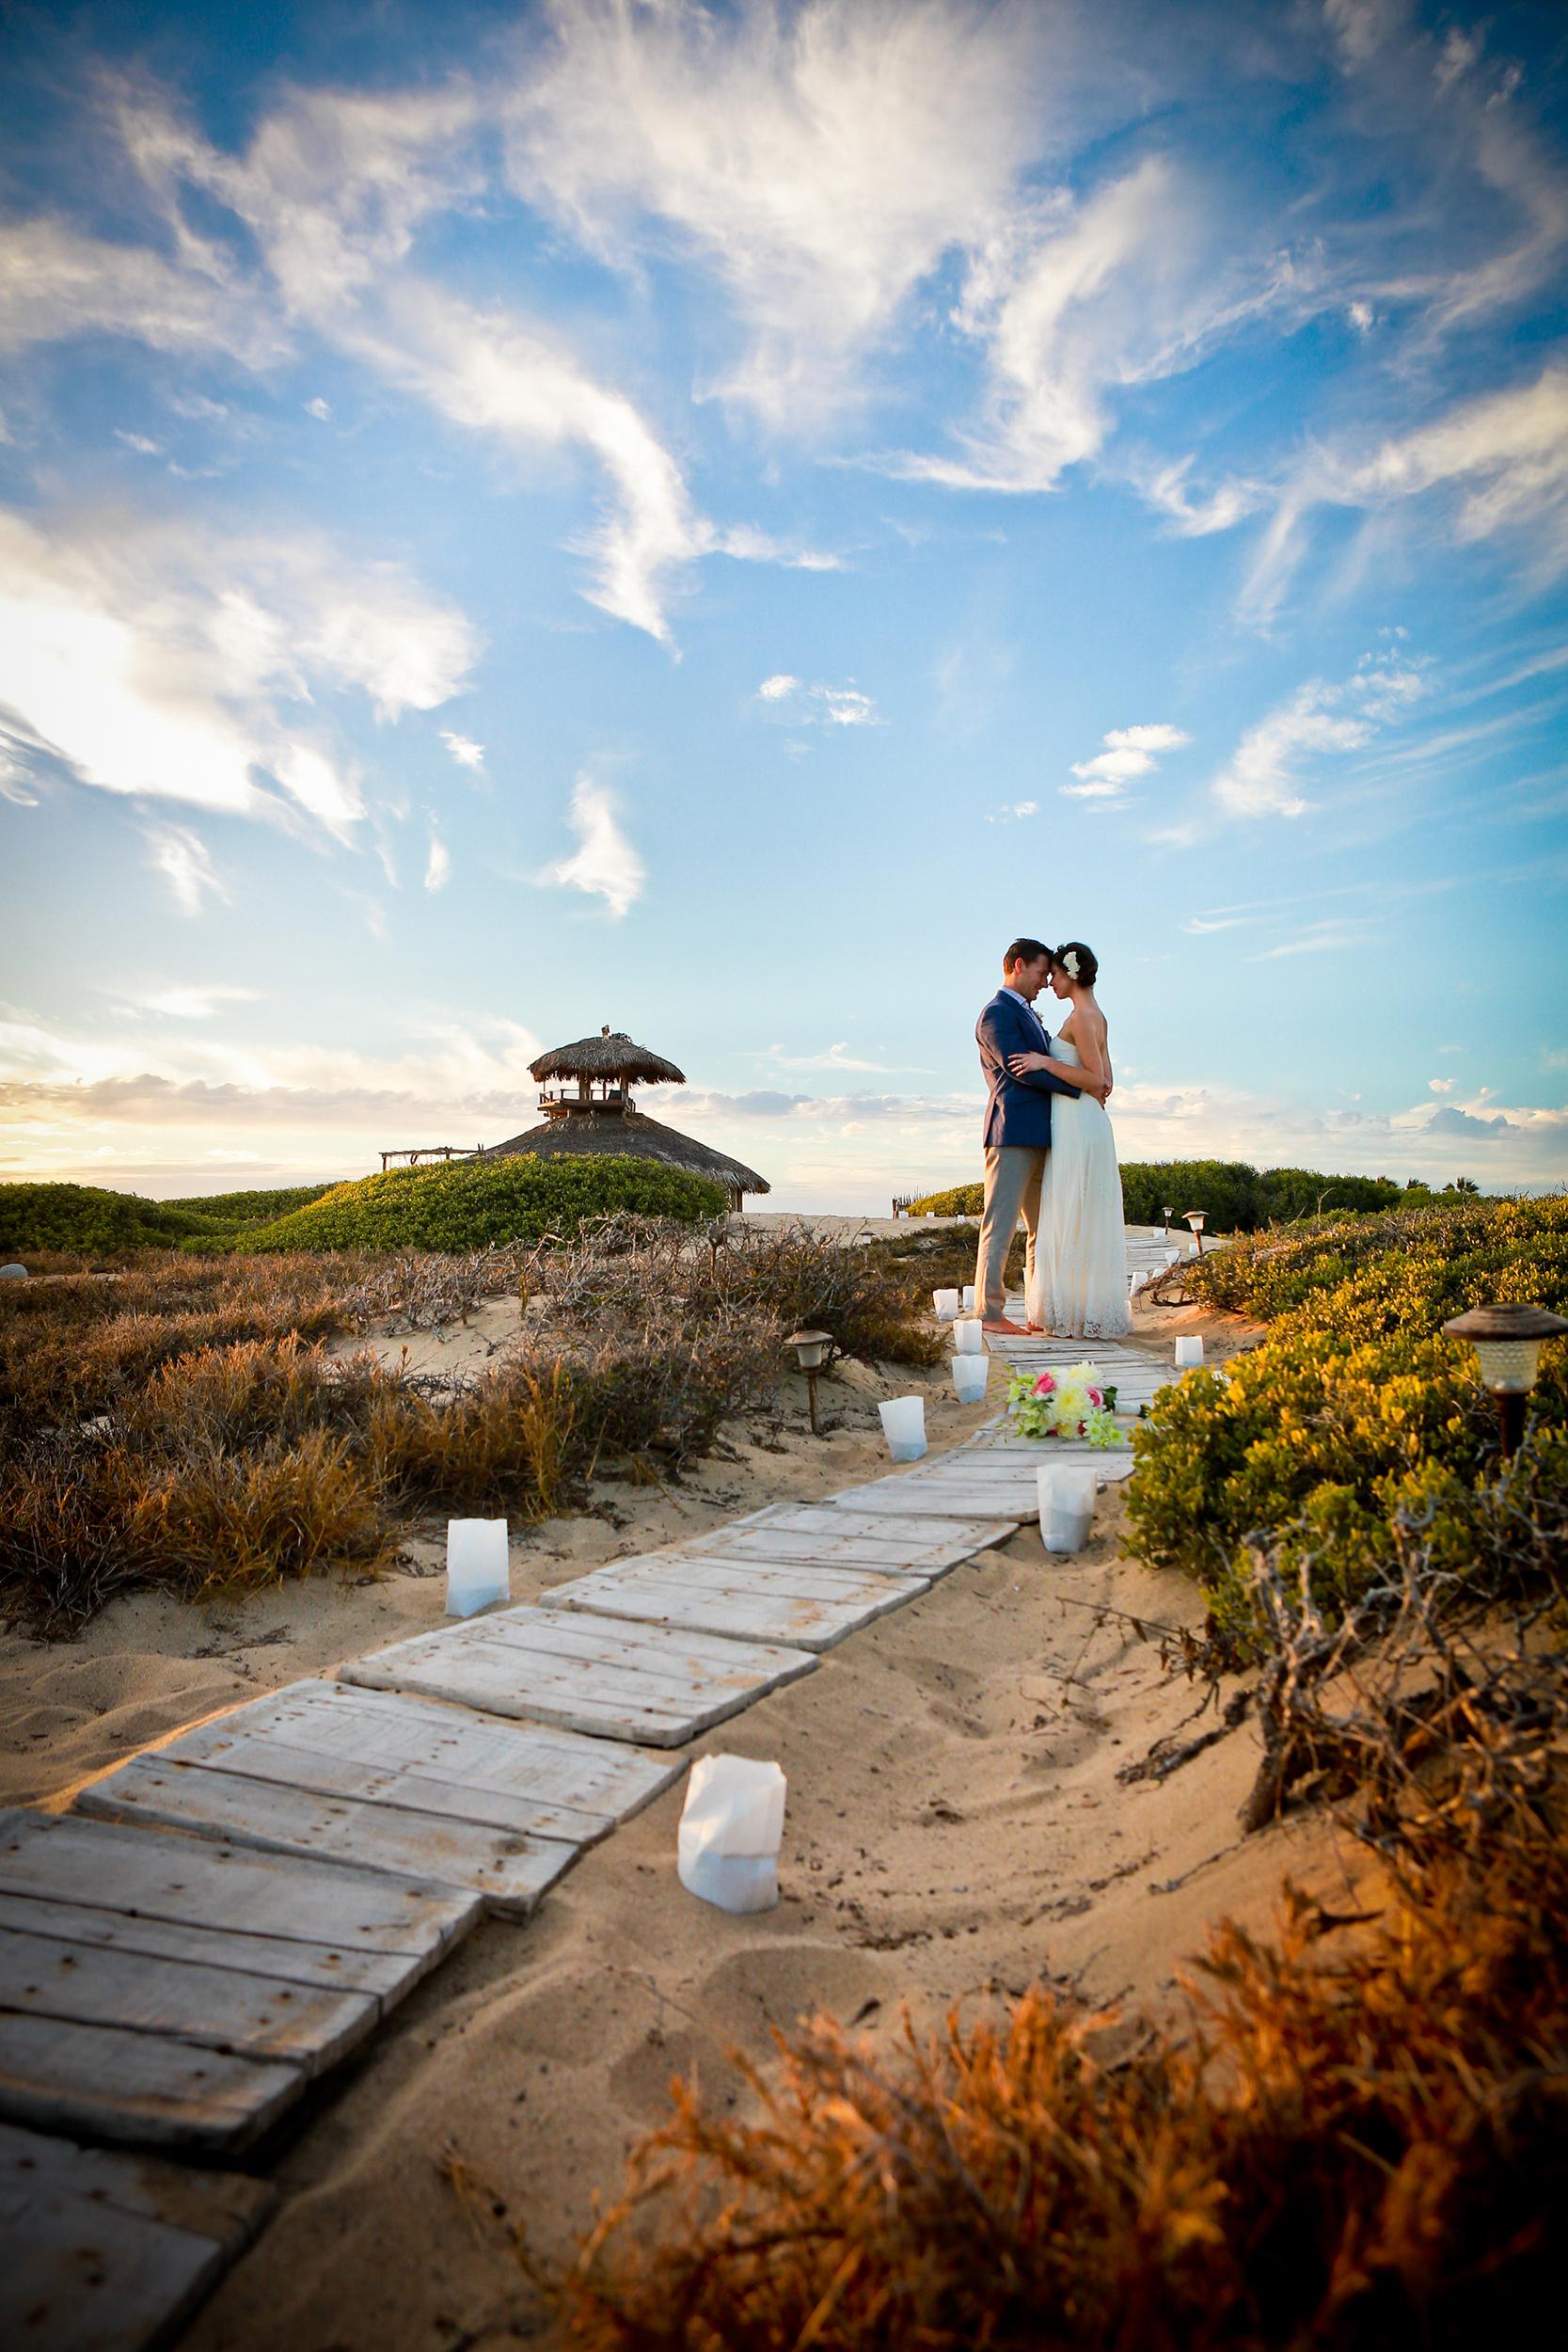 JKP-Destination-Weddings-0011.JPG